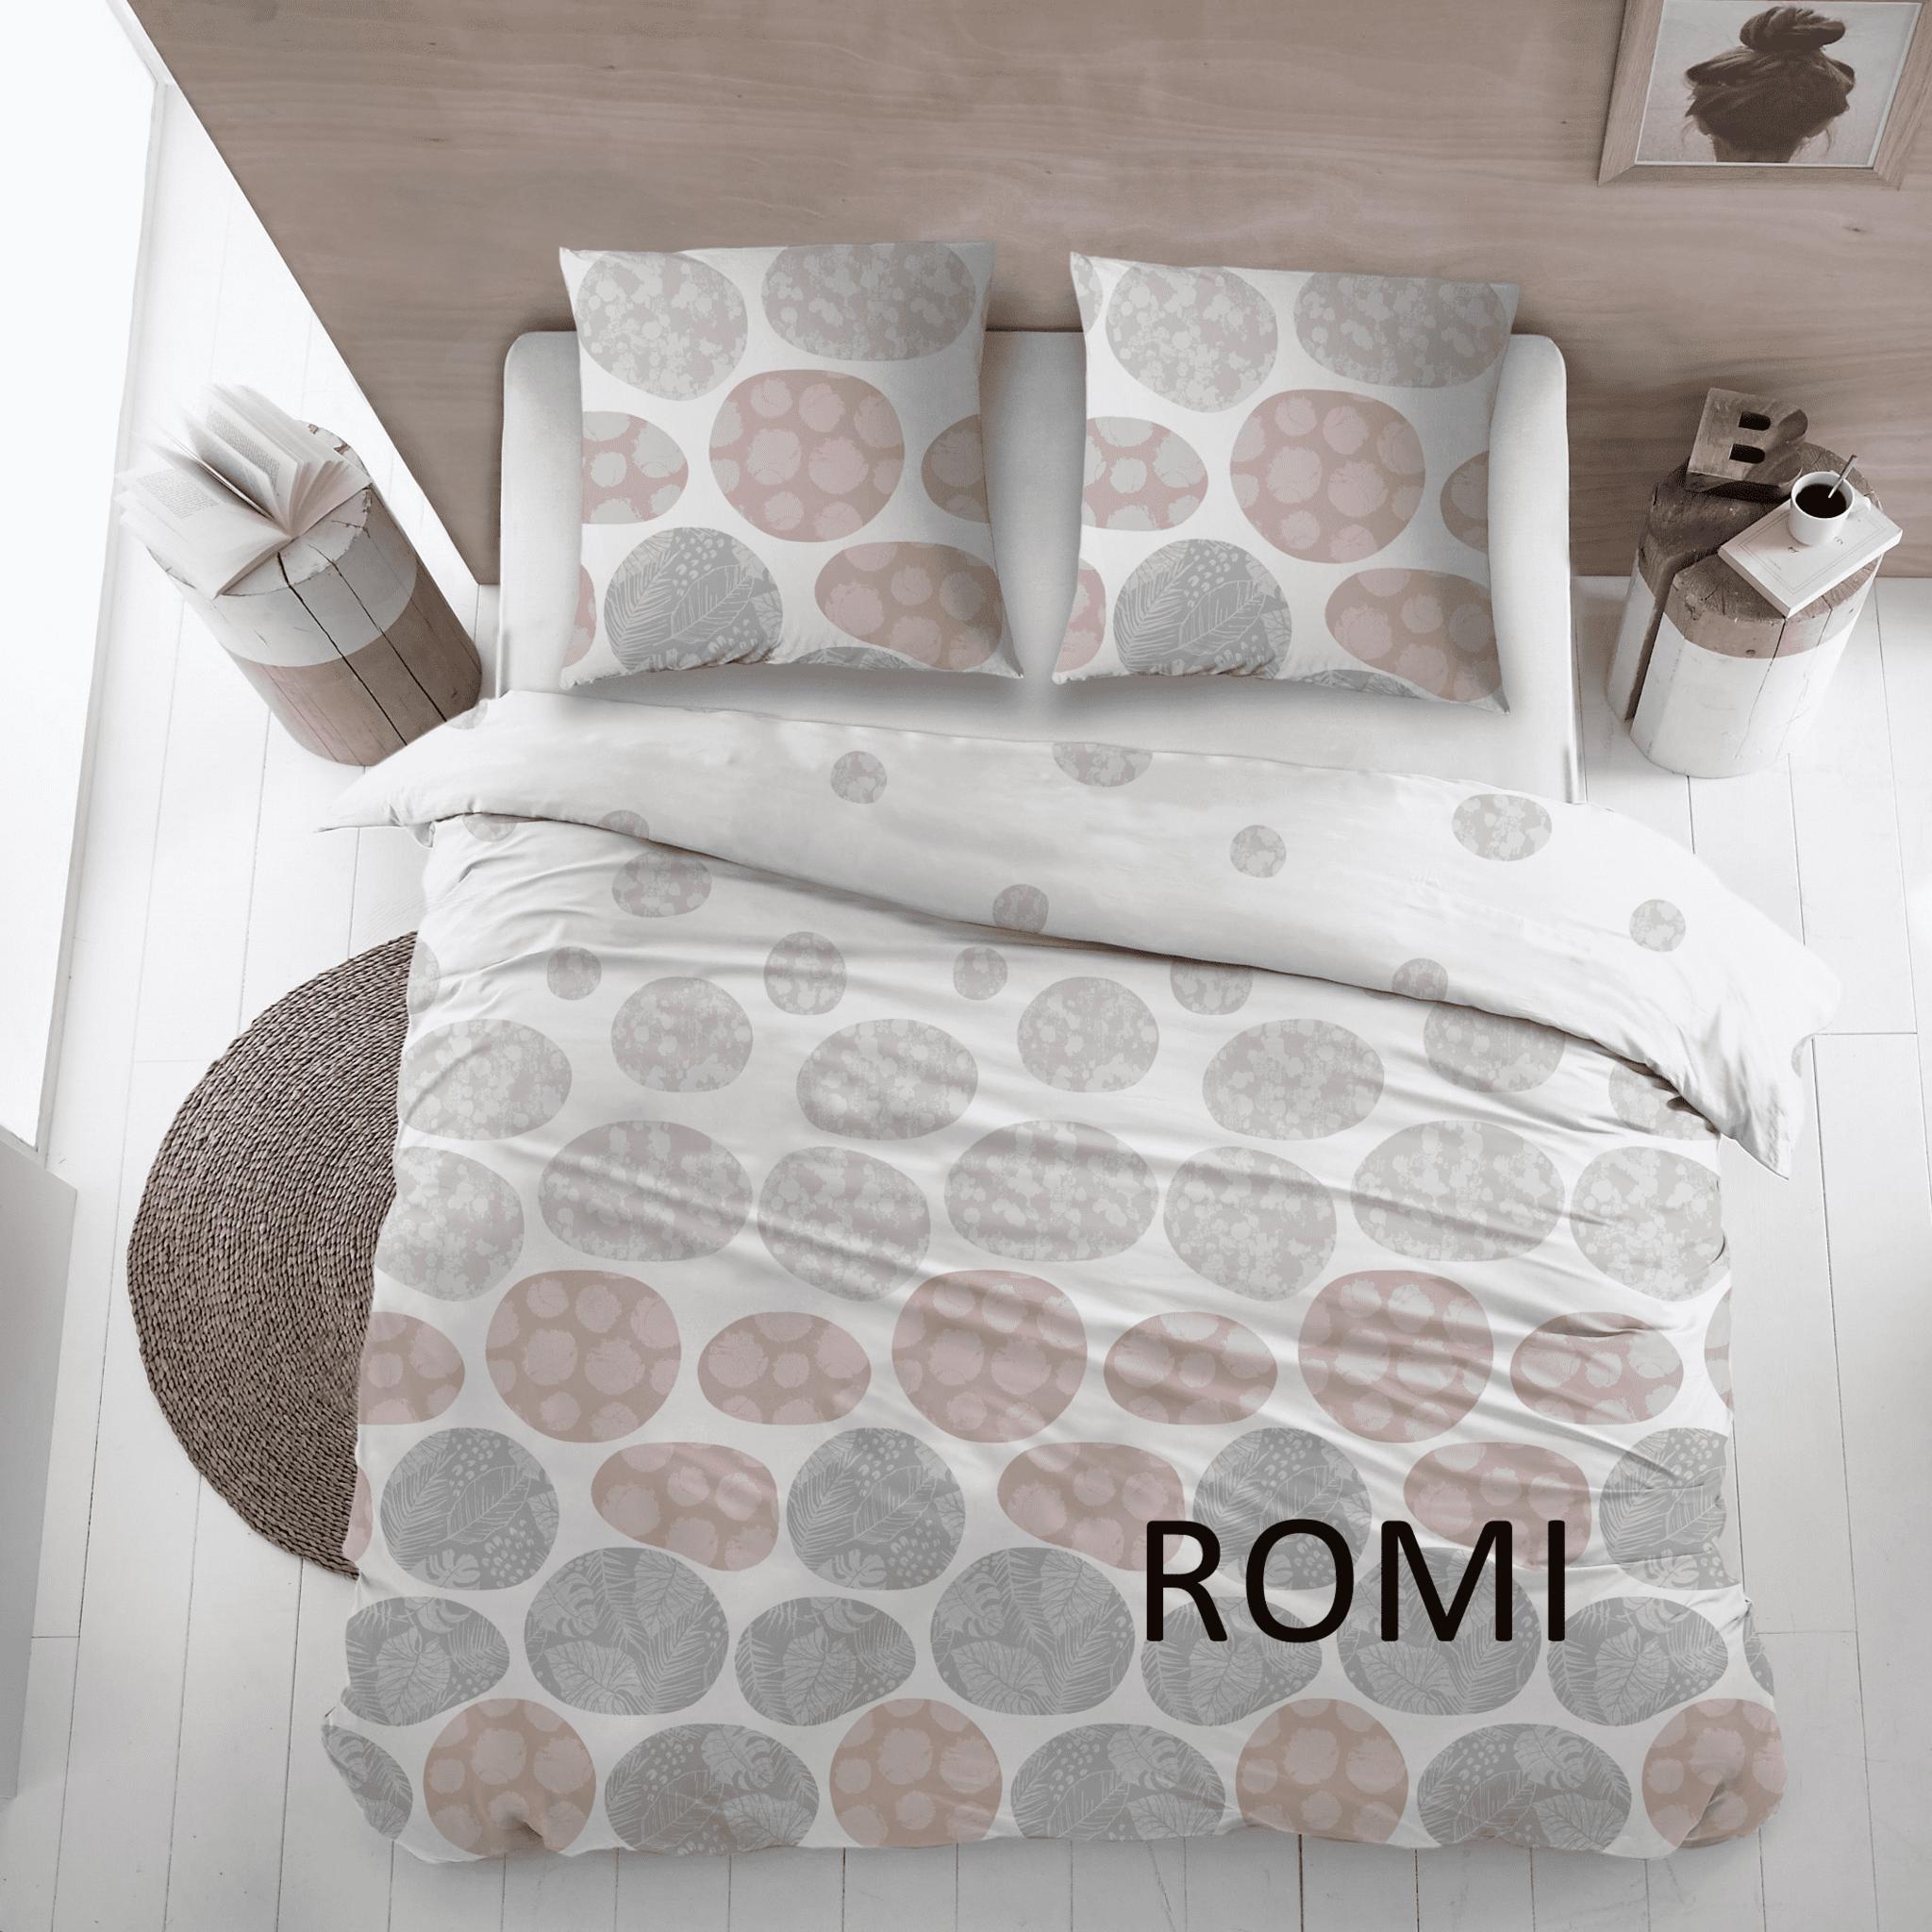 Cottons Dekbedovertrek Katoen Romi